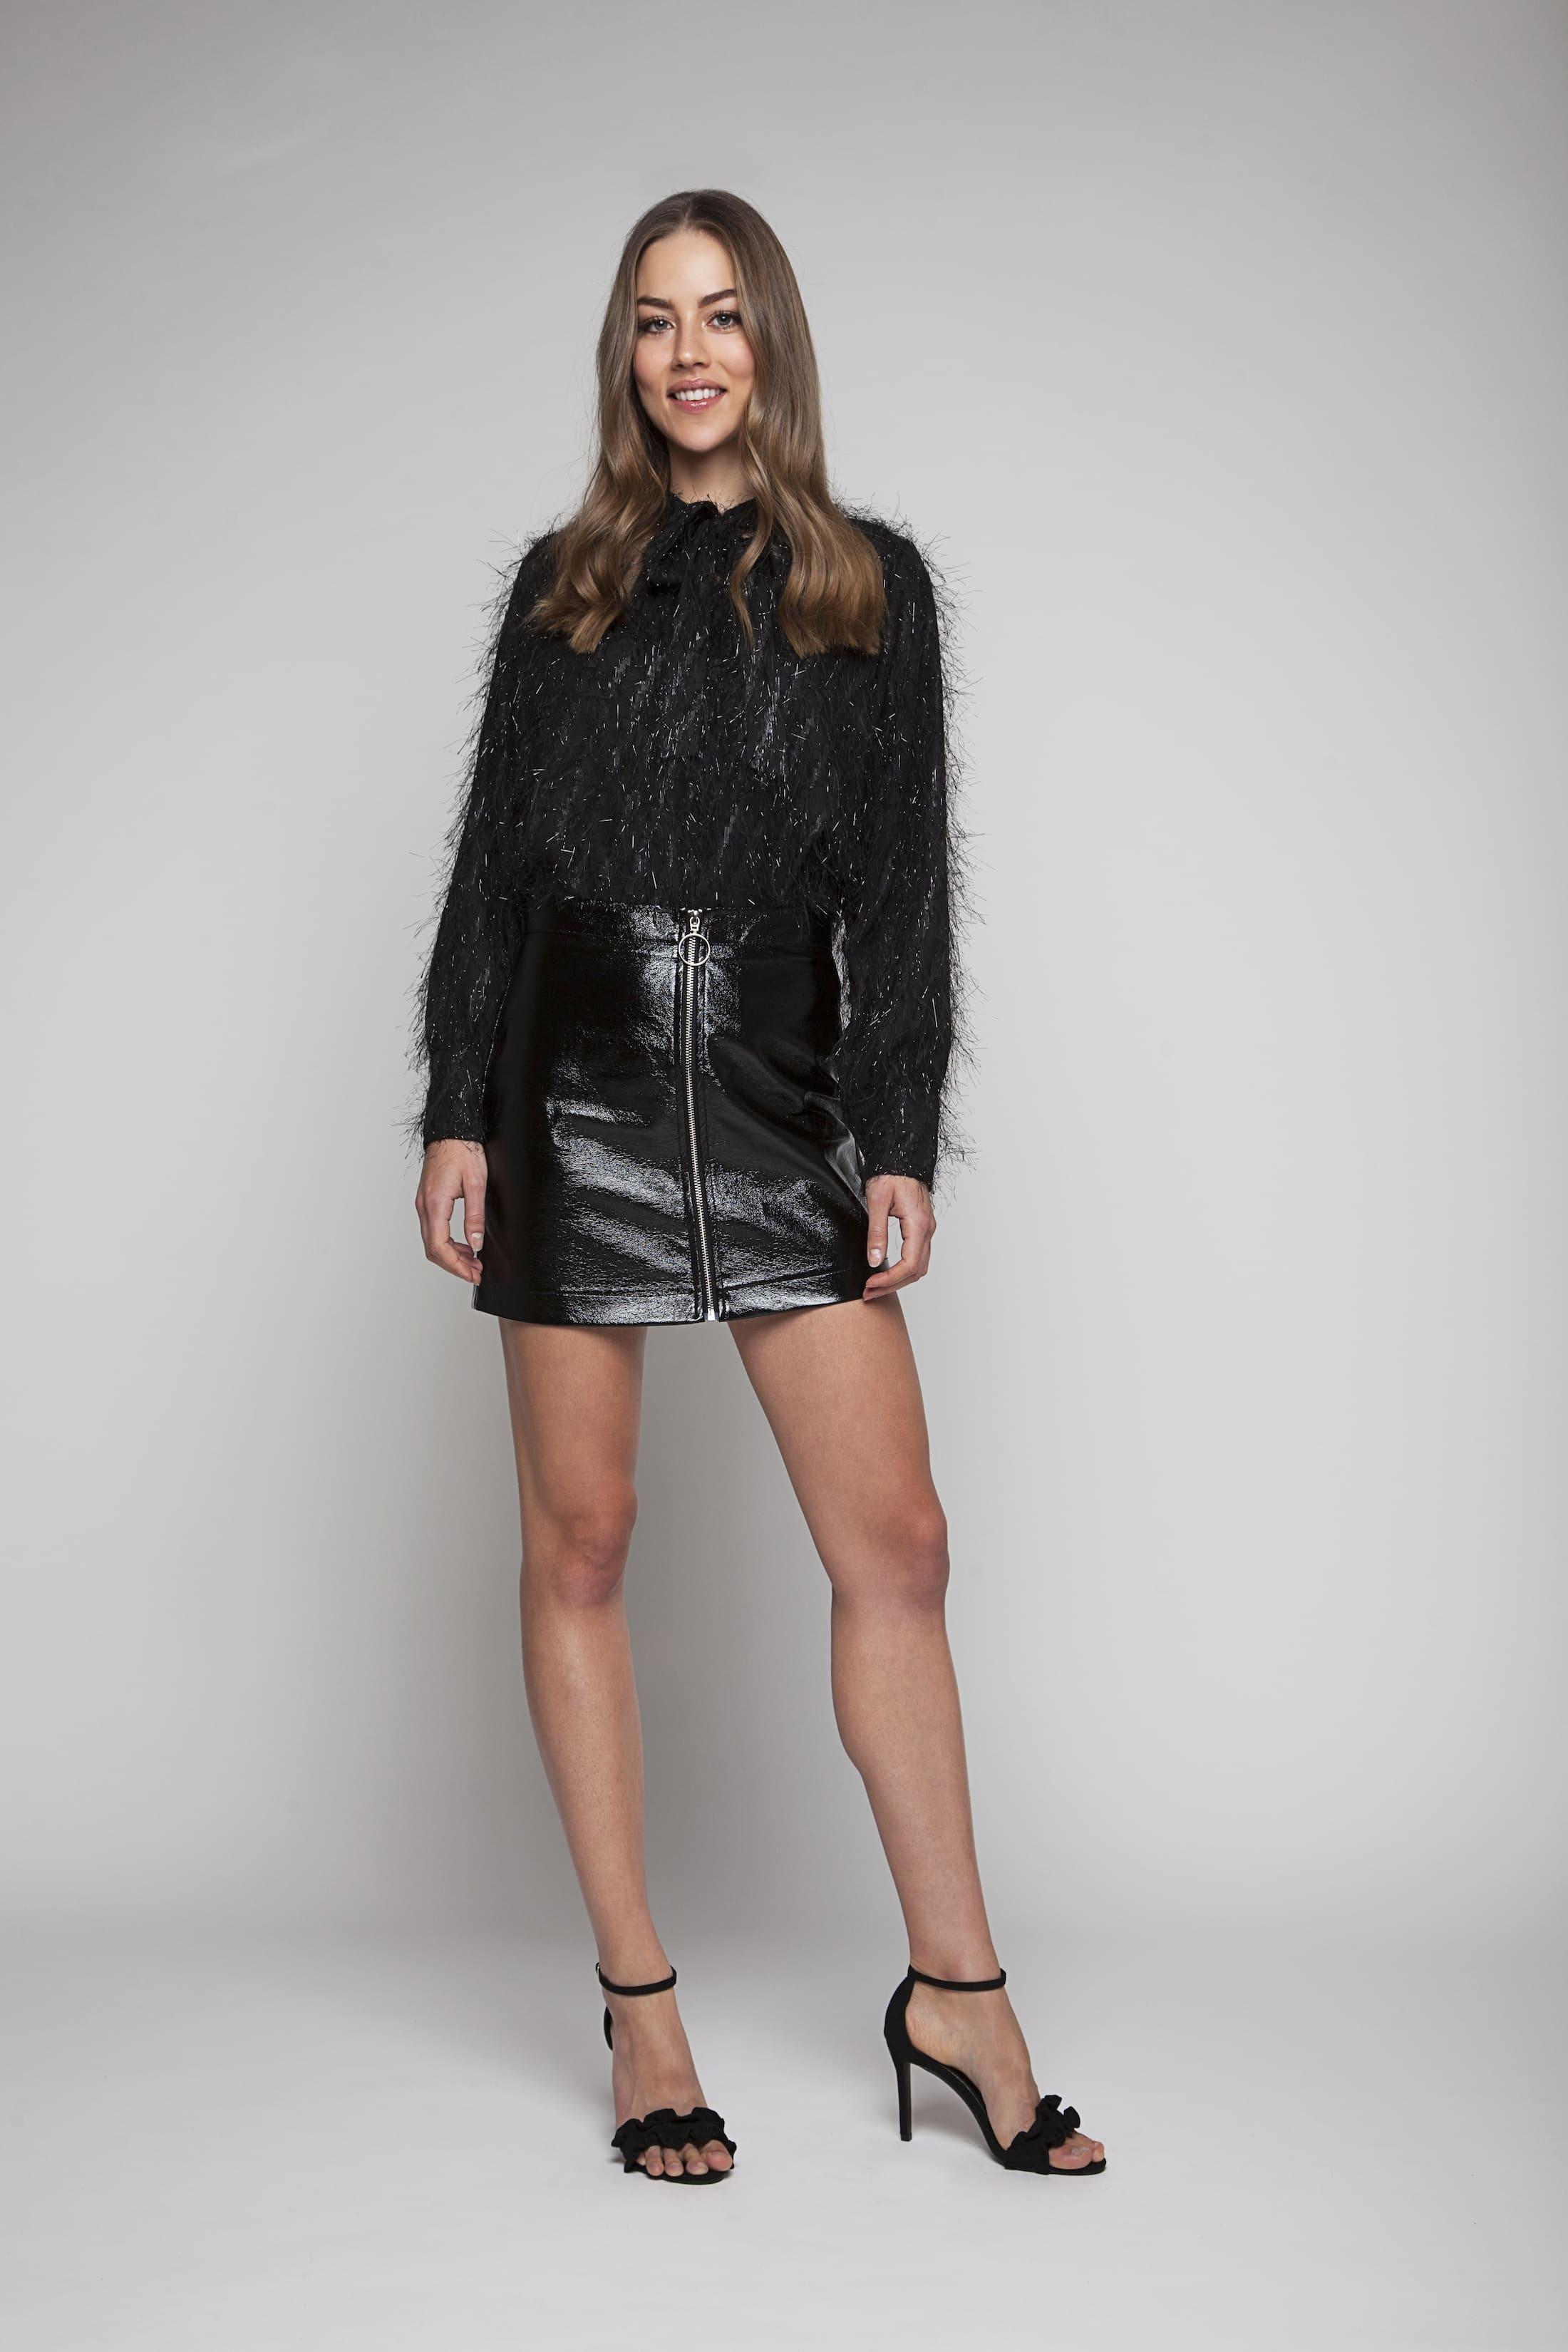 Black shiny skirt with zipper